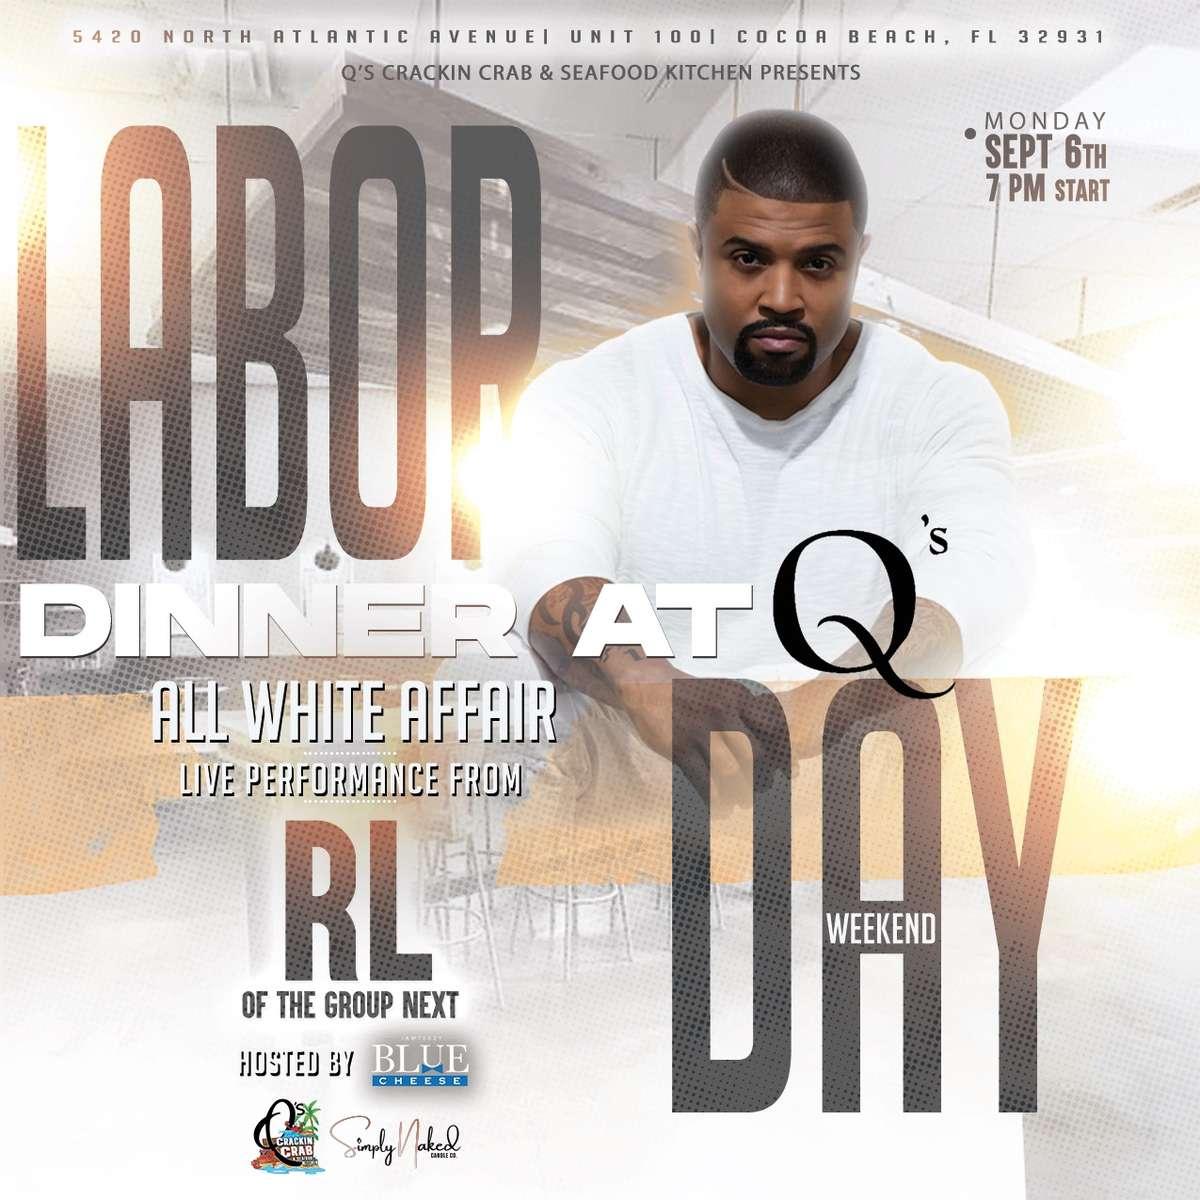 General Admission Dinner at Q's & Live Performance by singer RL